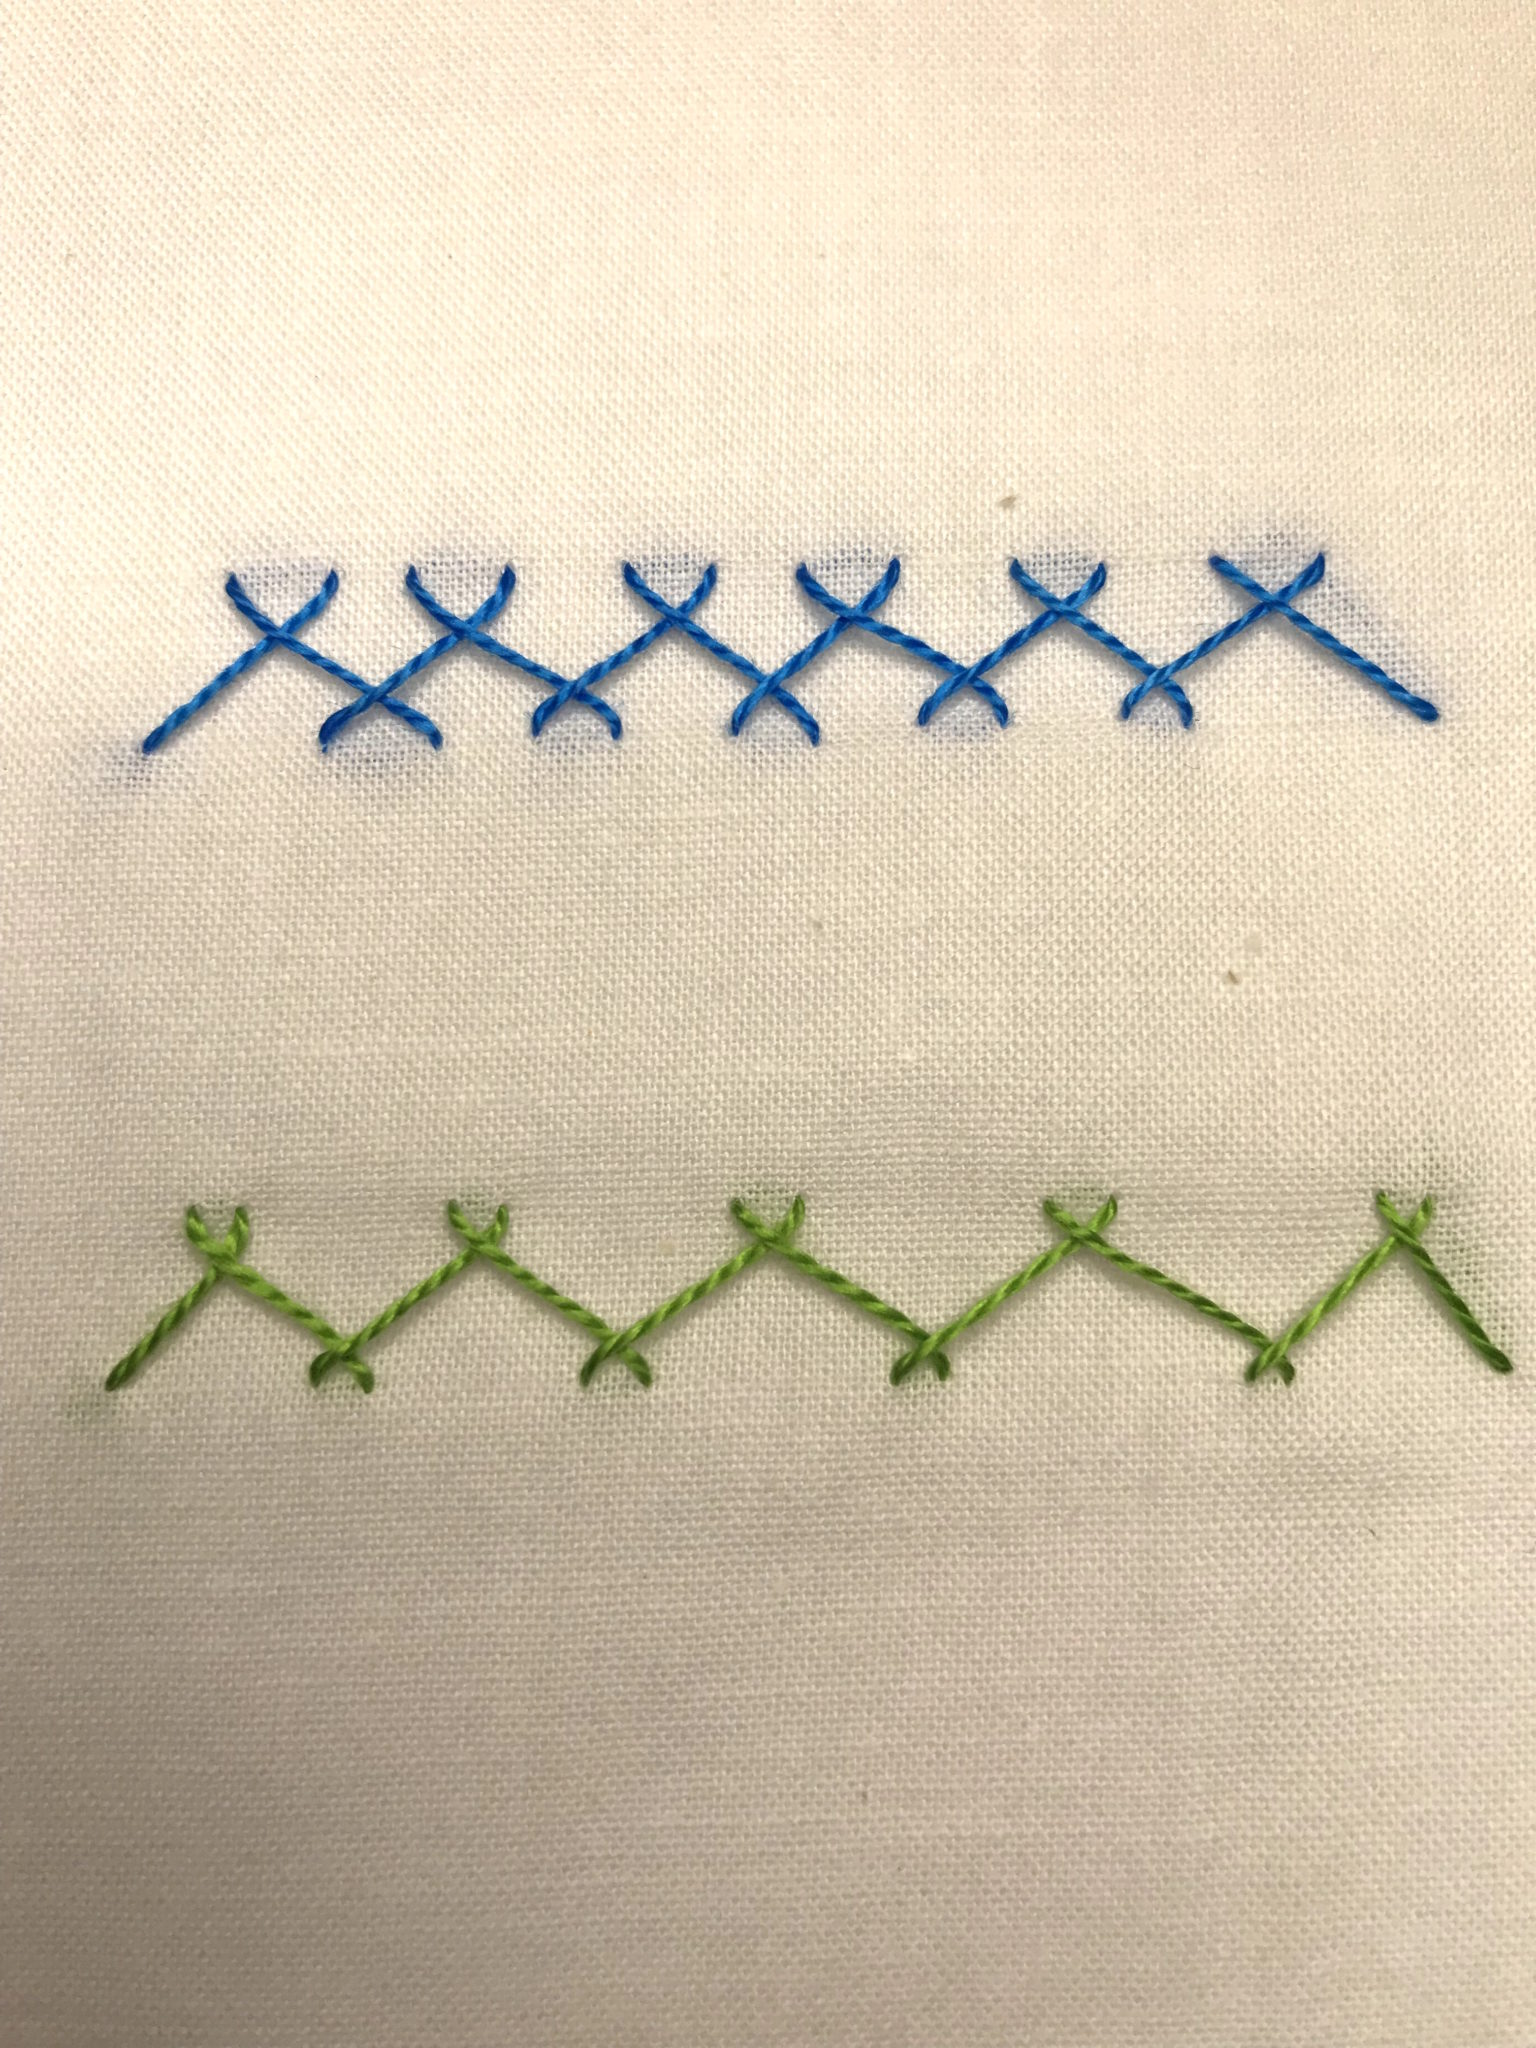 Herringbone Embroidery Stitch Final Sample